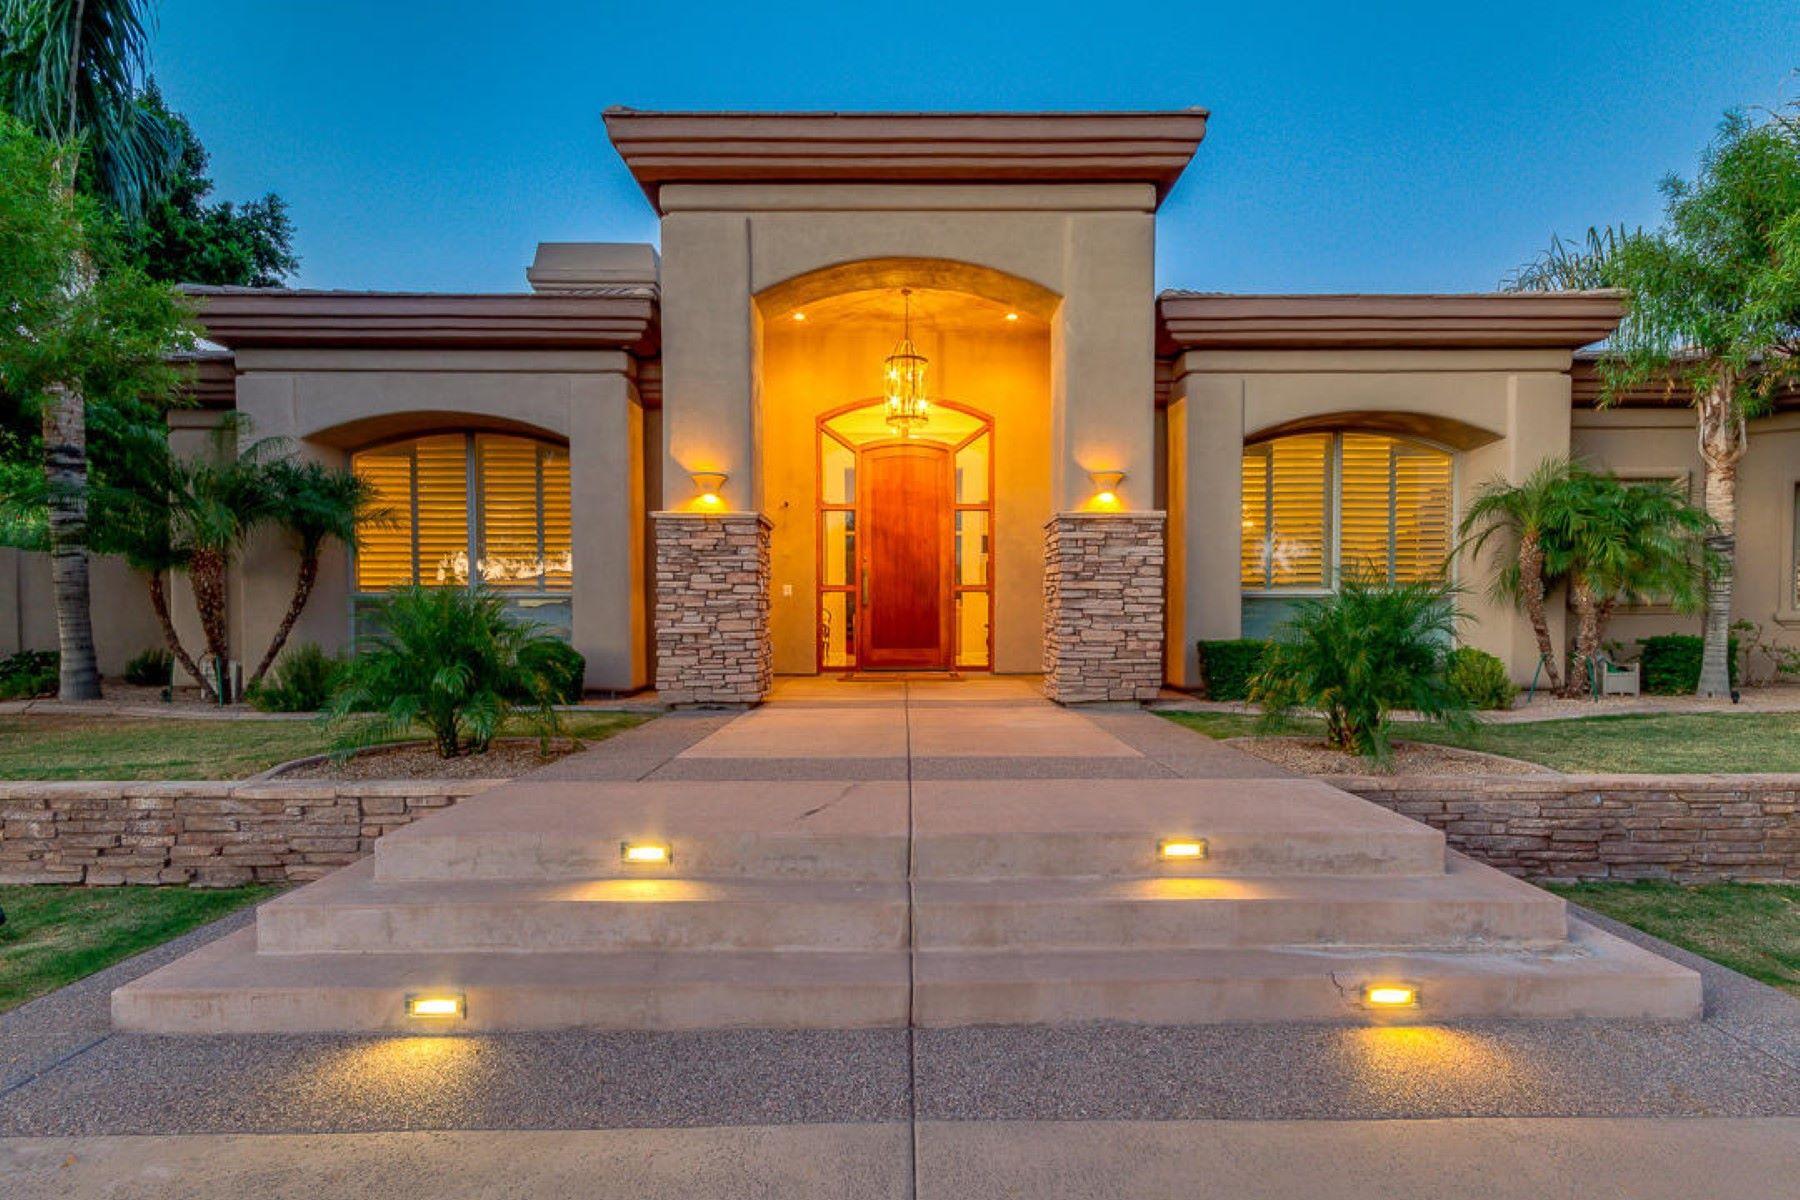 Single Family Homes for Sale at Royal Palm Estates 5134 E PALOMINO RD Phoenix, Arizona 85018 United States